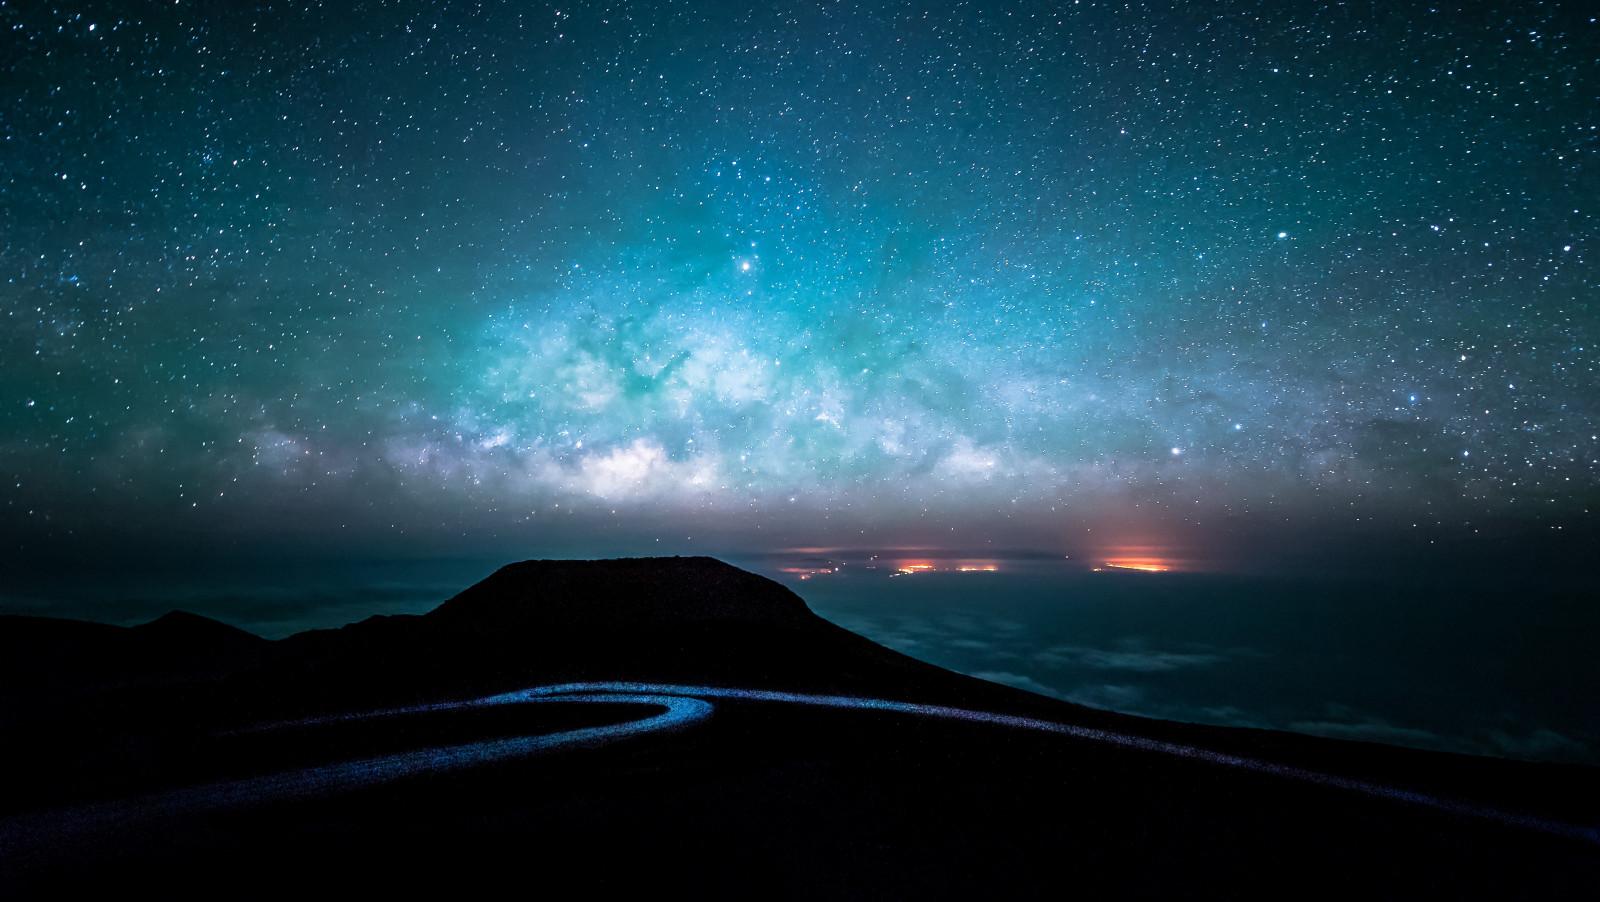 Wallpaper Pemandangan Malam Galaksi Langit Bintang Sinar